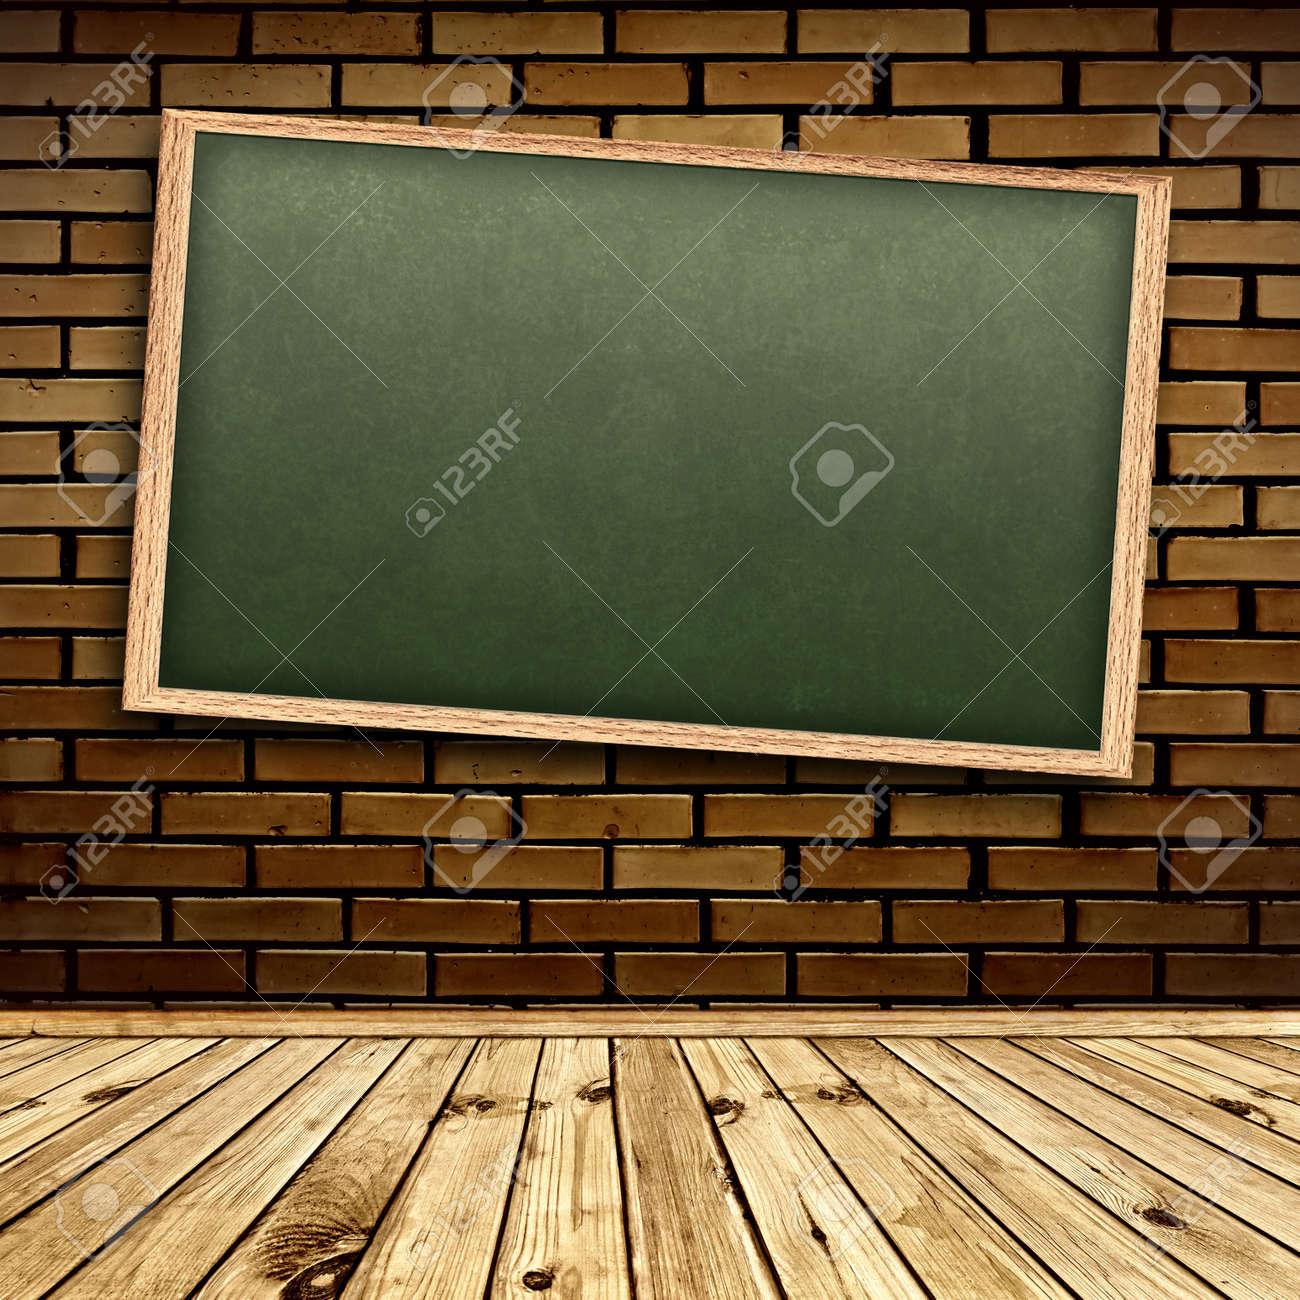 Empty school blackboard at brick wall in interior with wooden floor Stock Photo - 7303345